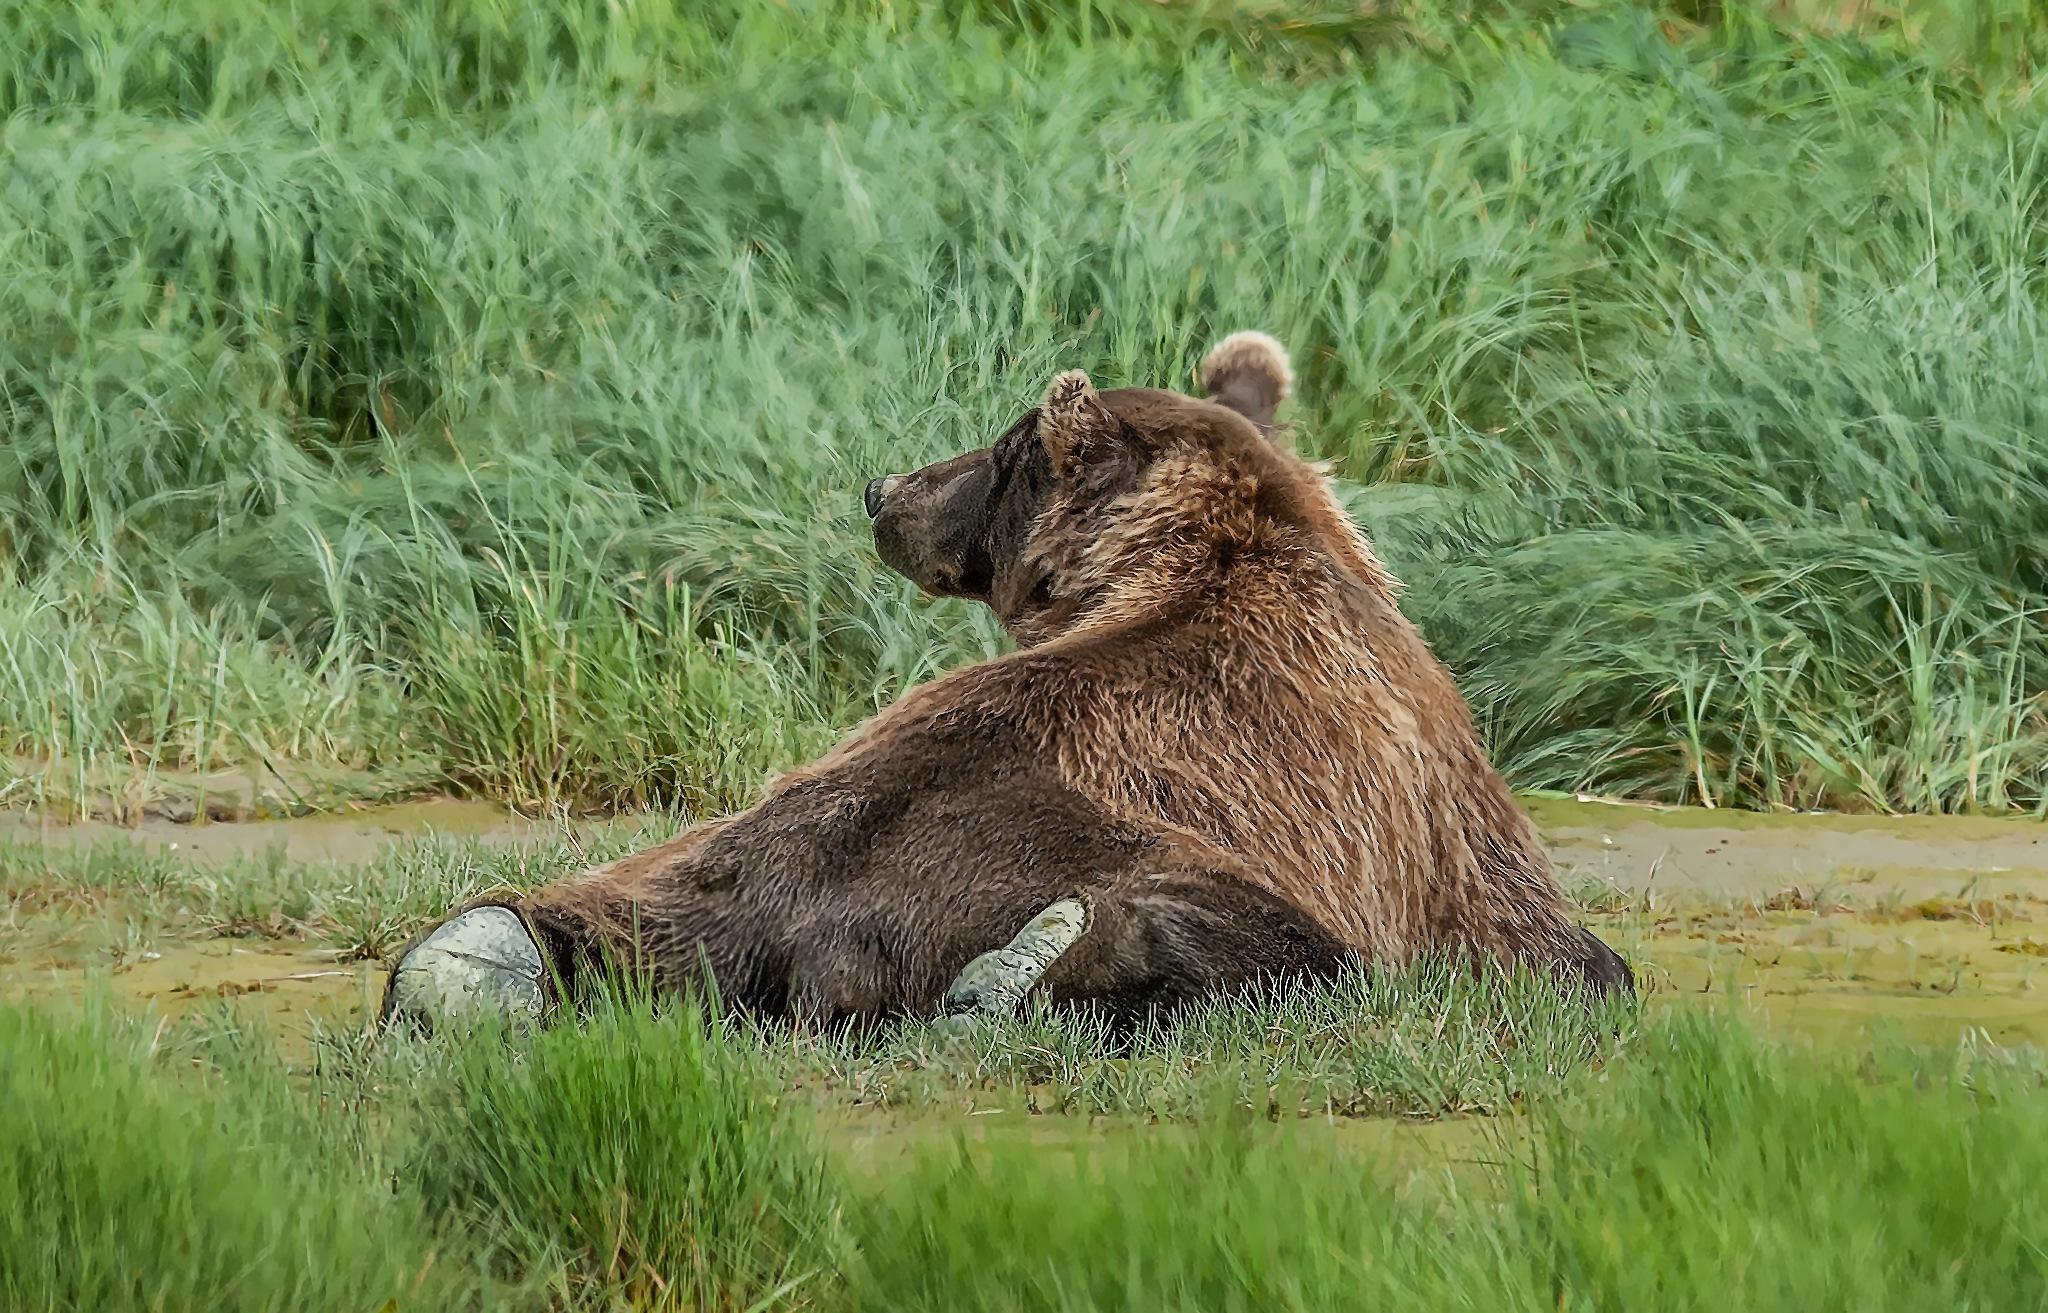 Lazy Bear by Herbert Stachelberger